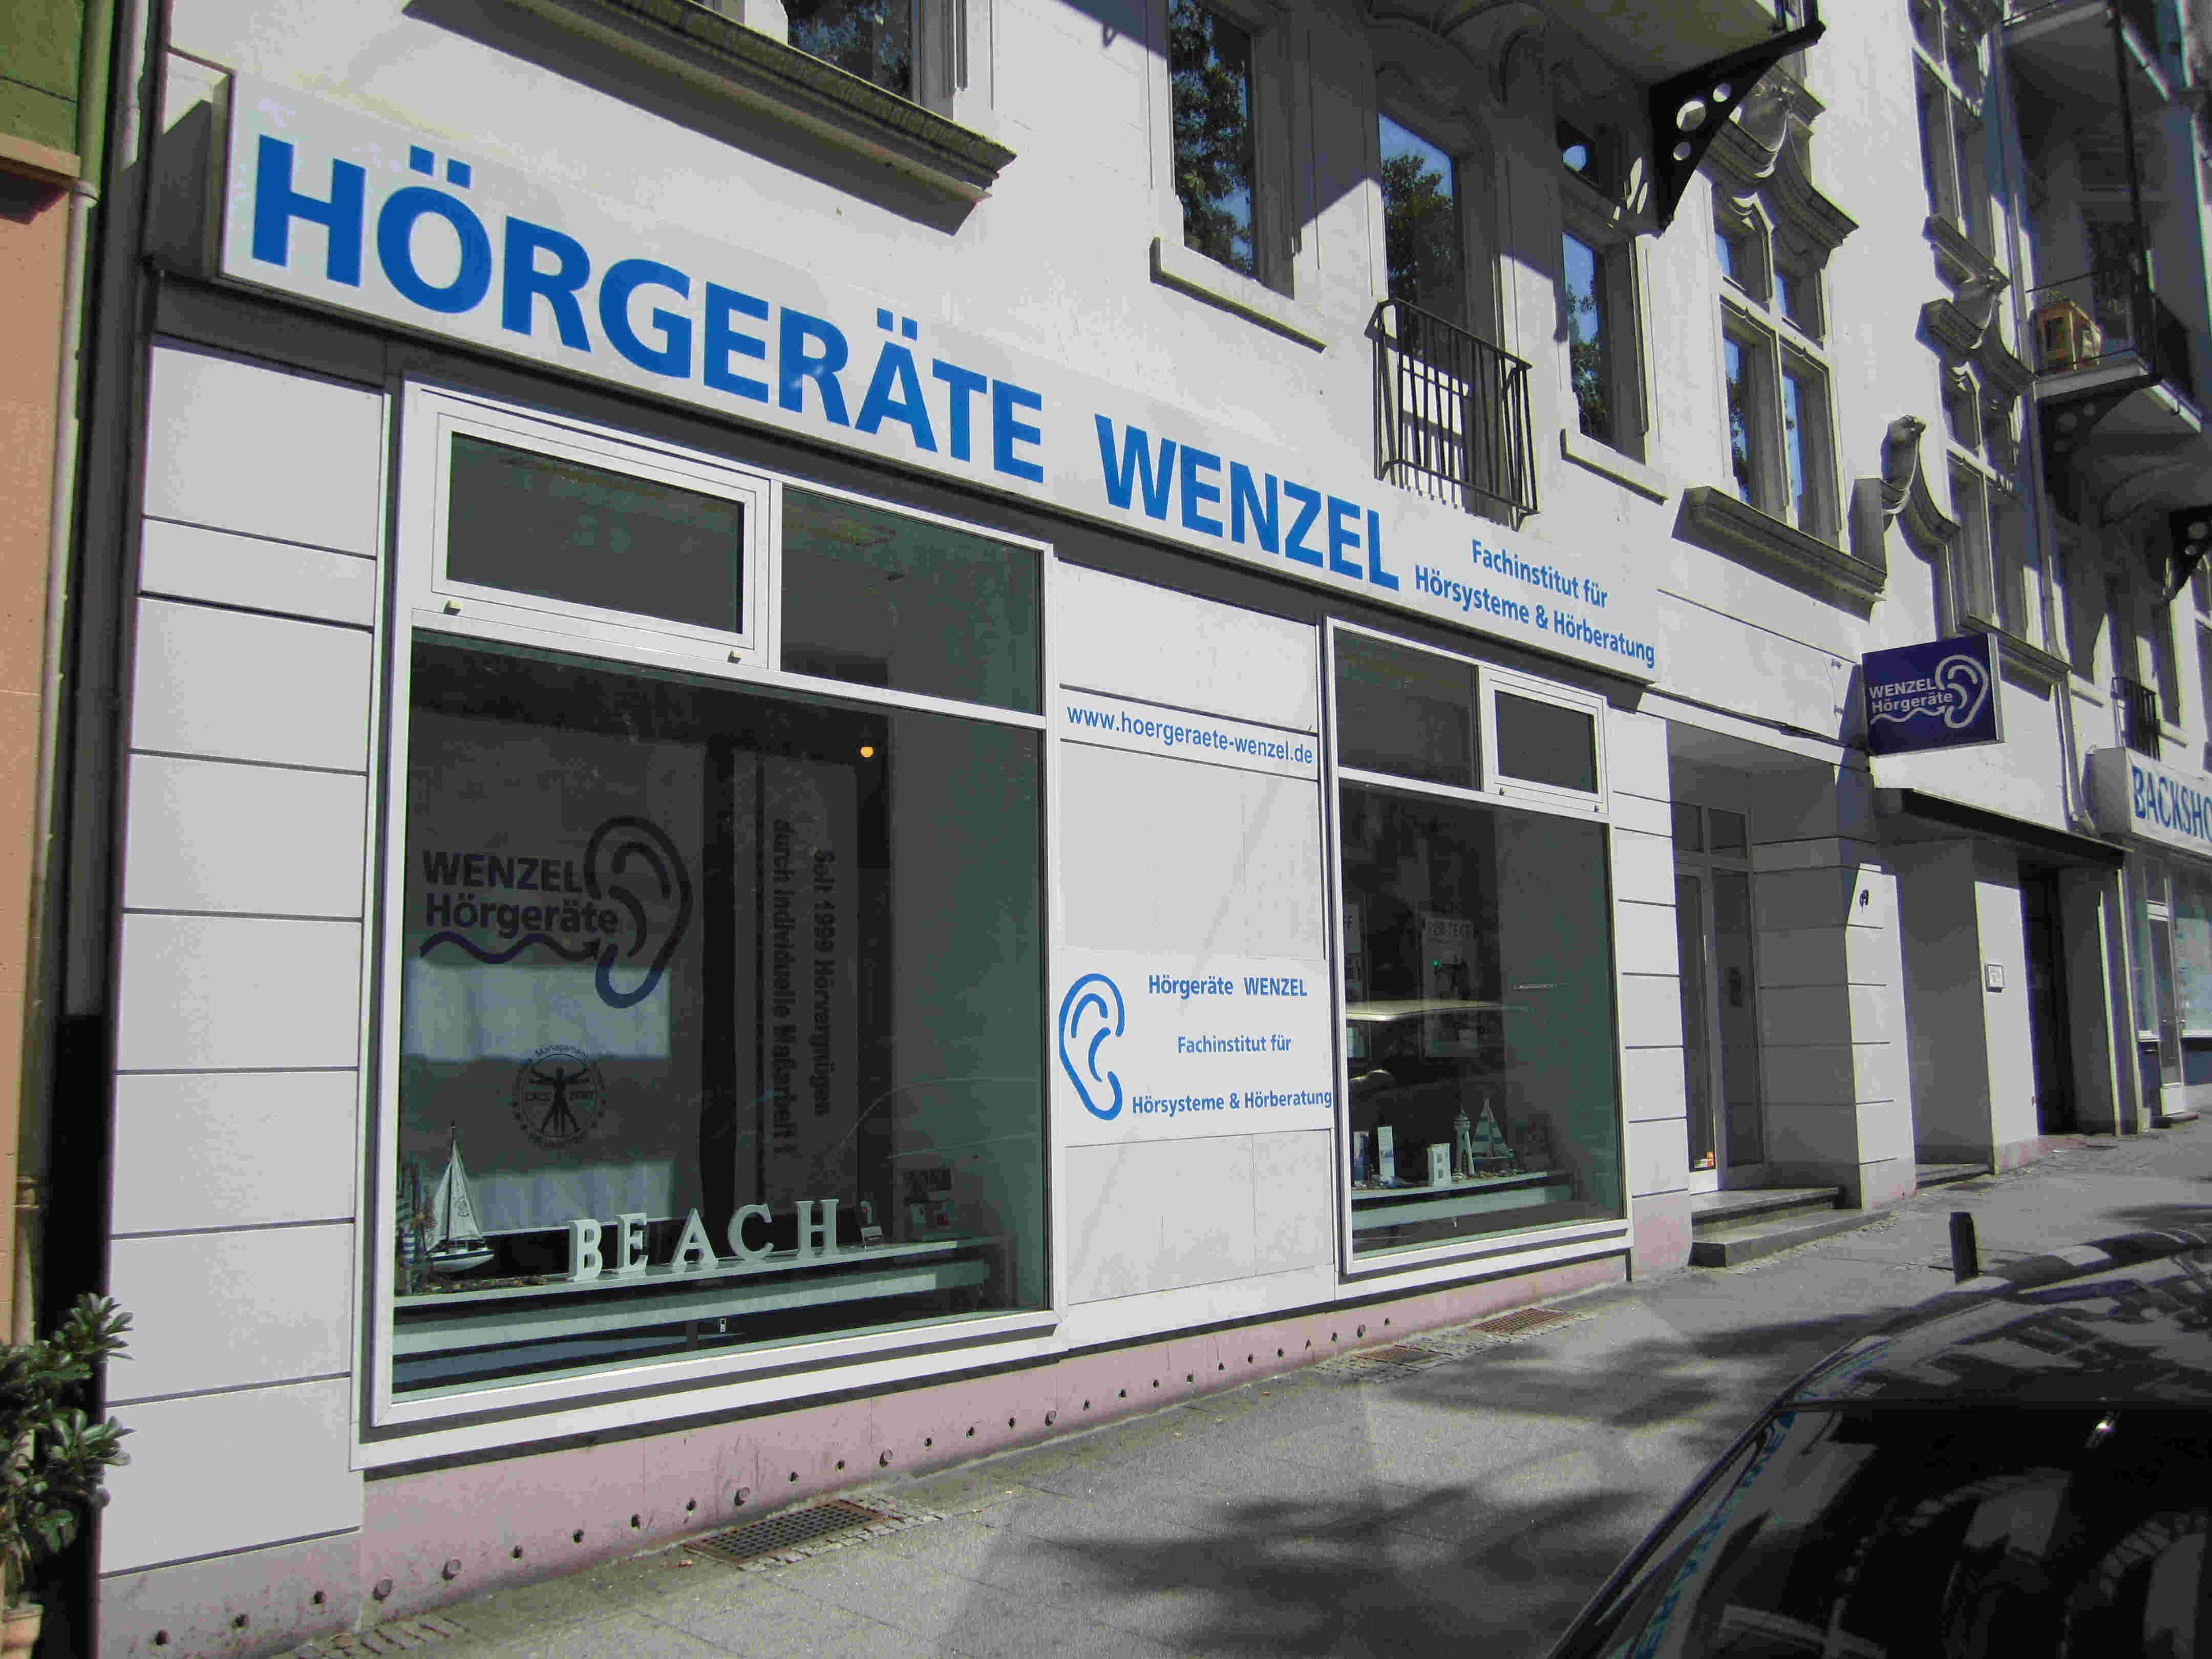 Hörgeräte Wenzel GmbH